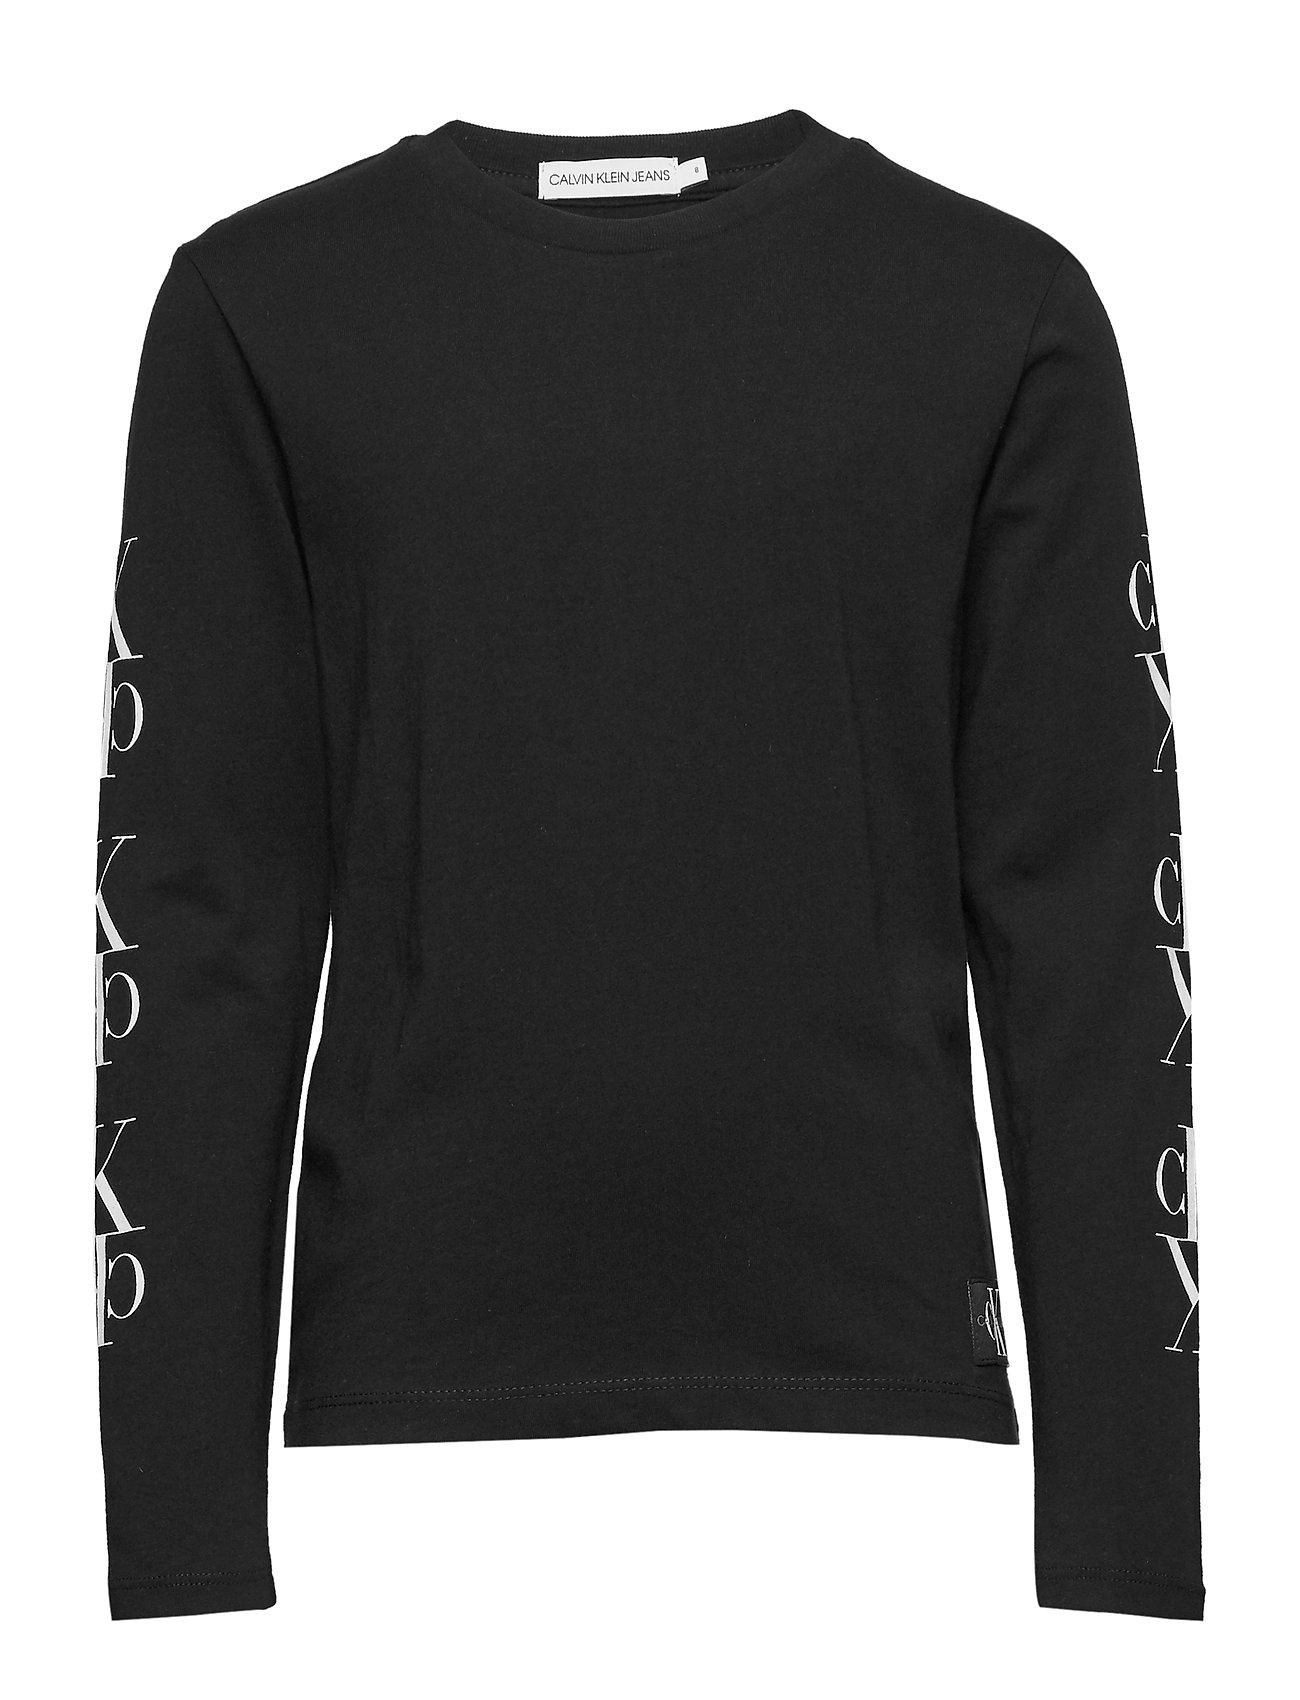 Image of Mirror Monogram Ls T-Shirt Langærmet T-shirt Sort Calvin Klein (3285598435)